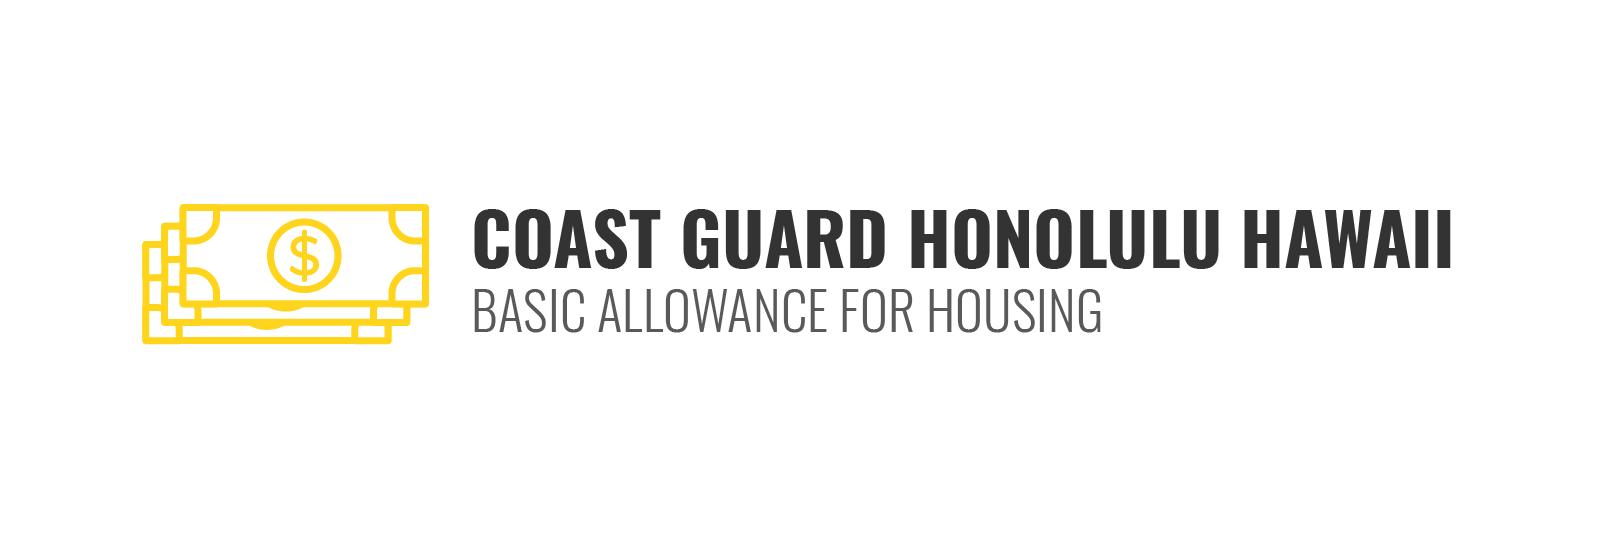 BAH for Coast Guard Housing in Honolulu Hawaii